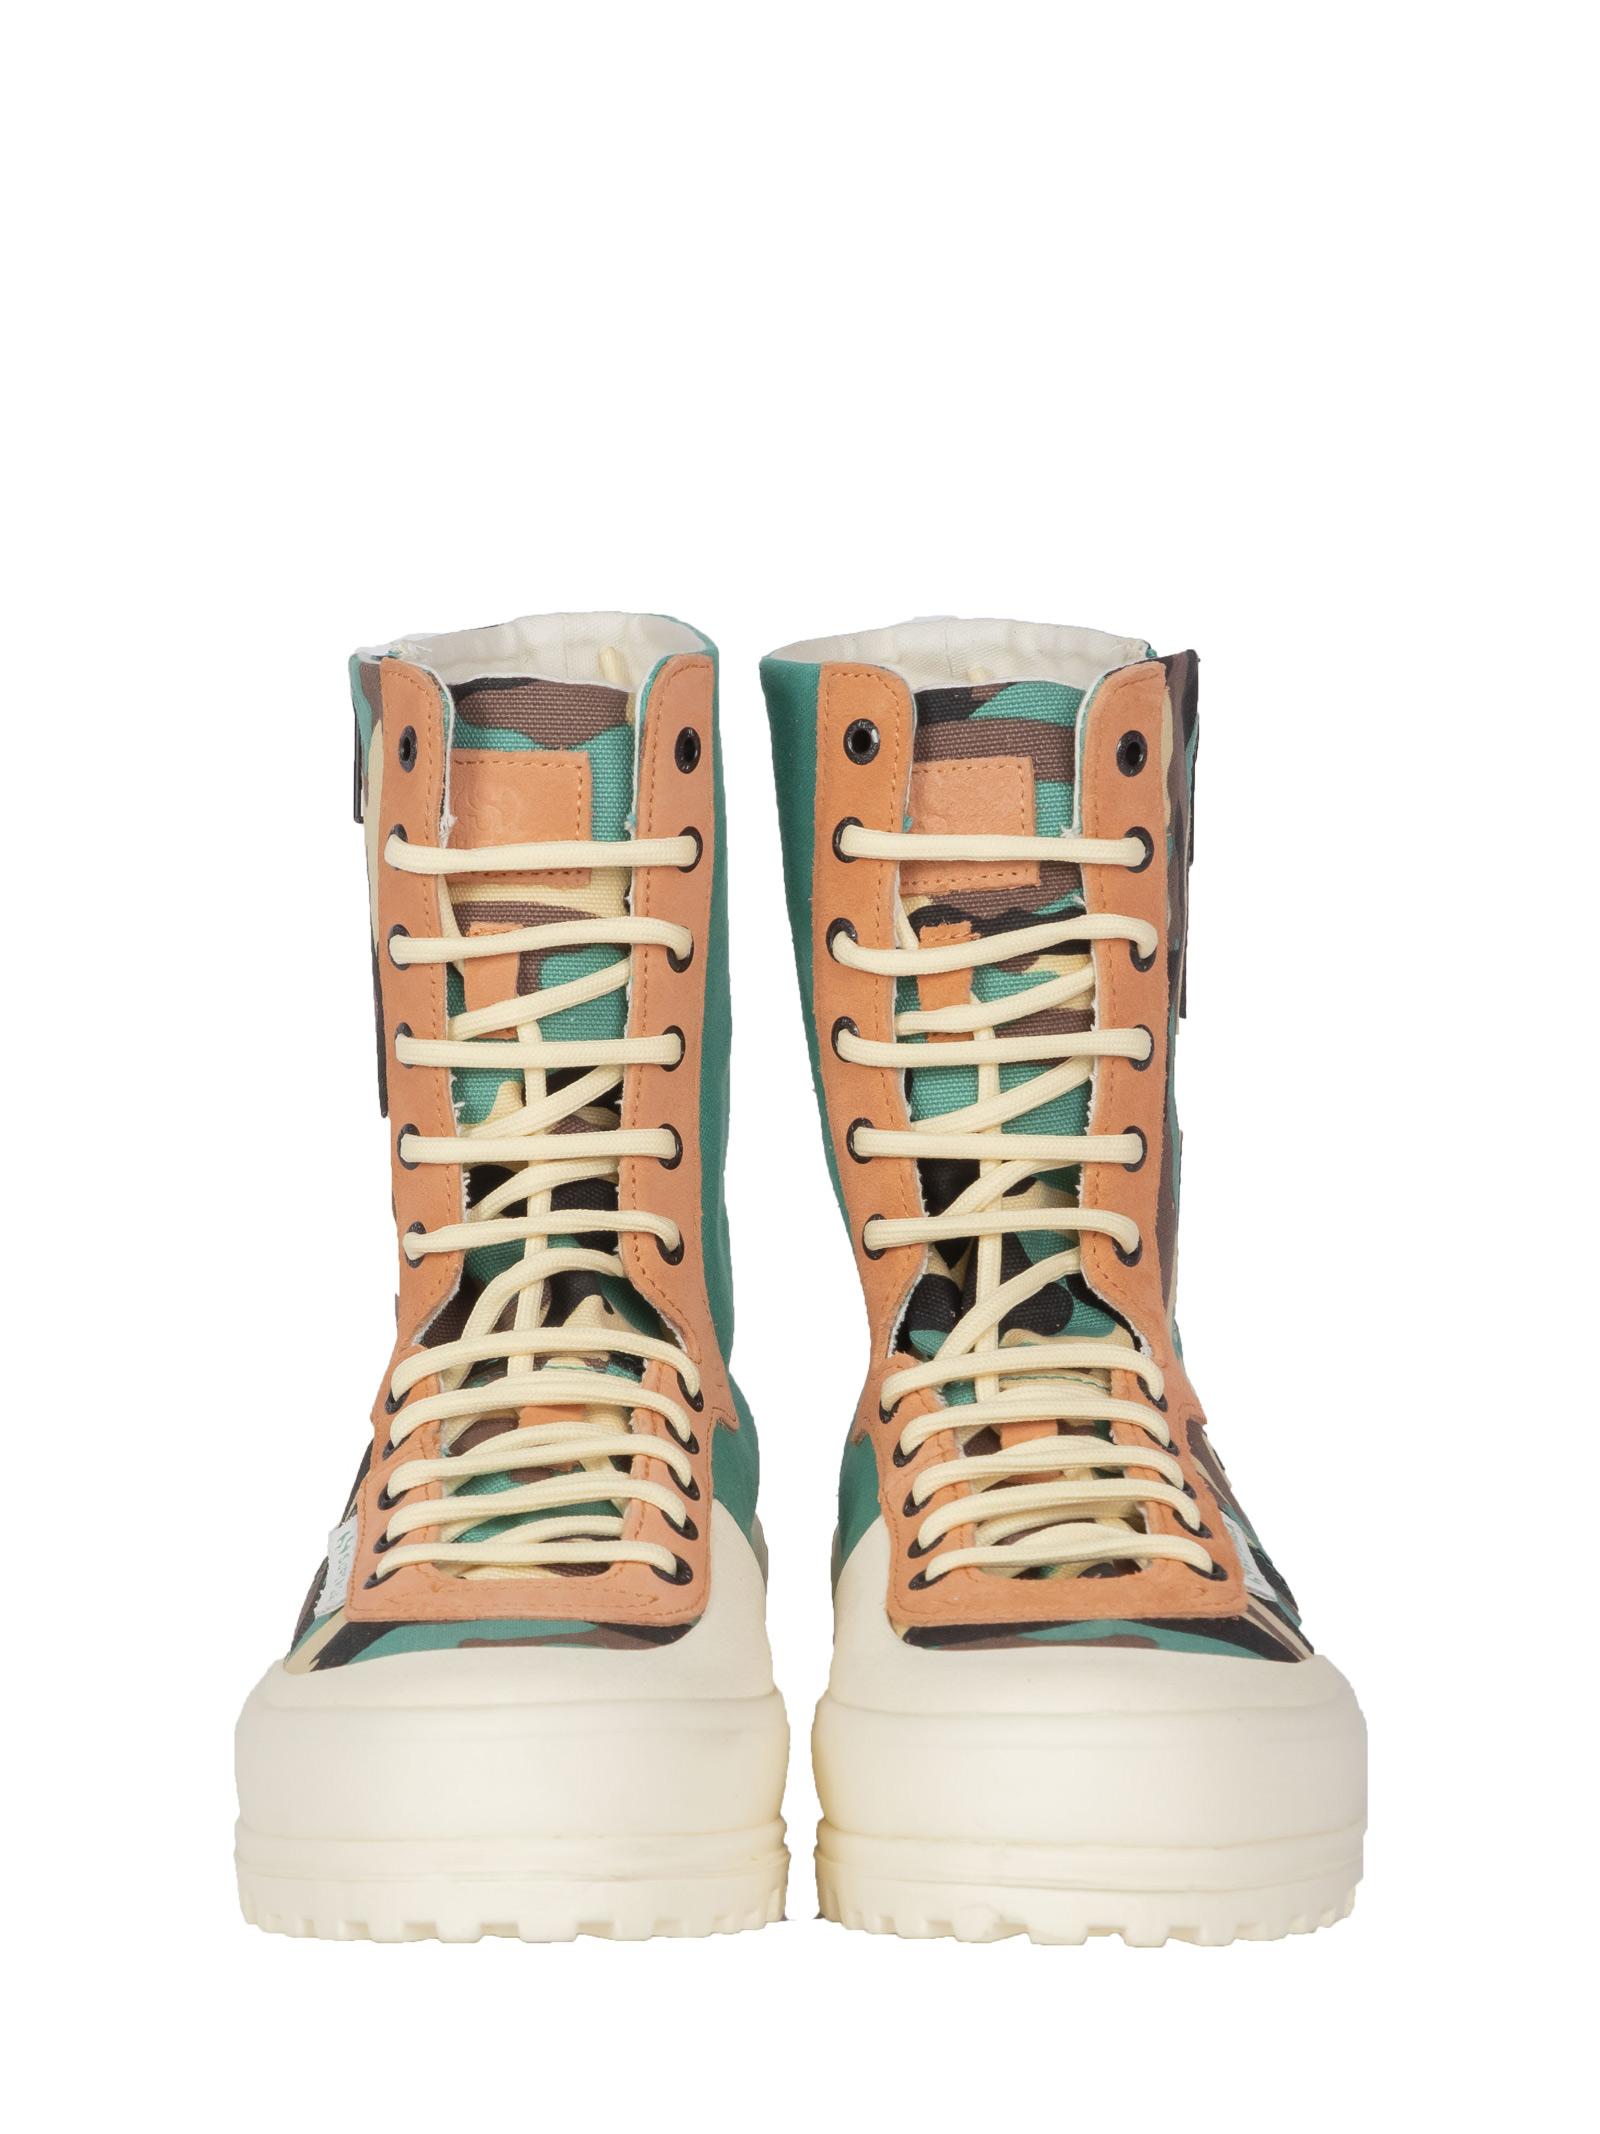 Alpina mid camo SUPERGA PER PAURA | Sneakers | 2360 COTFANUCAMOUFLAGE